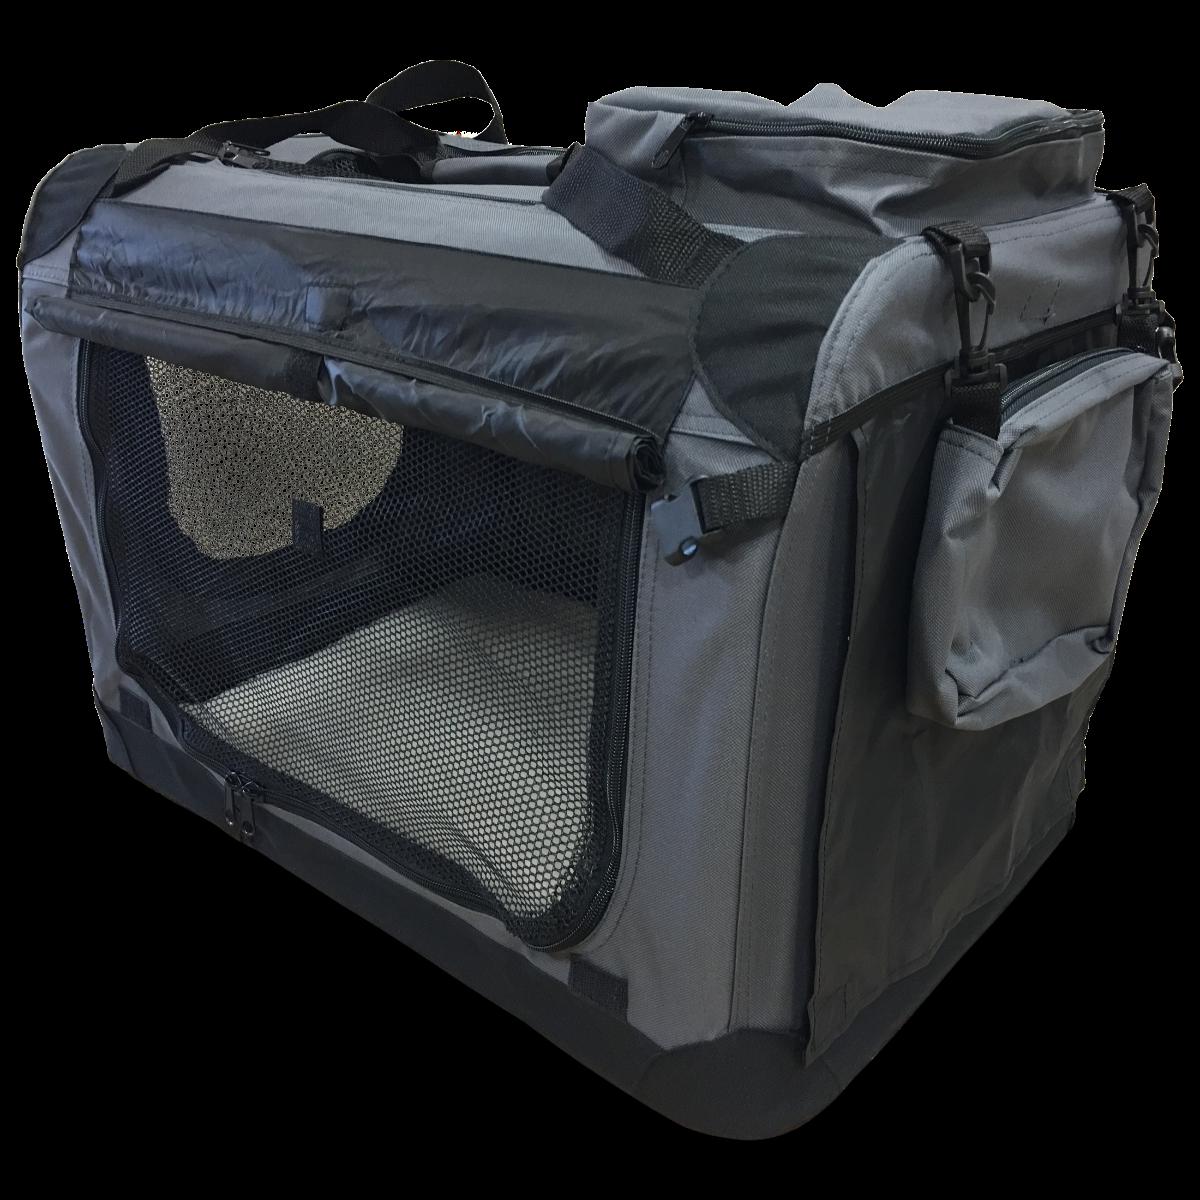 Nylon Bench Topmast Premium - 481004 - Diergigant Shop